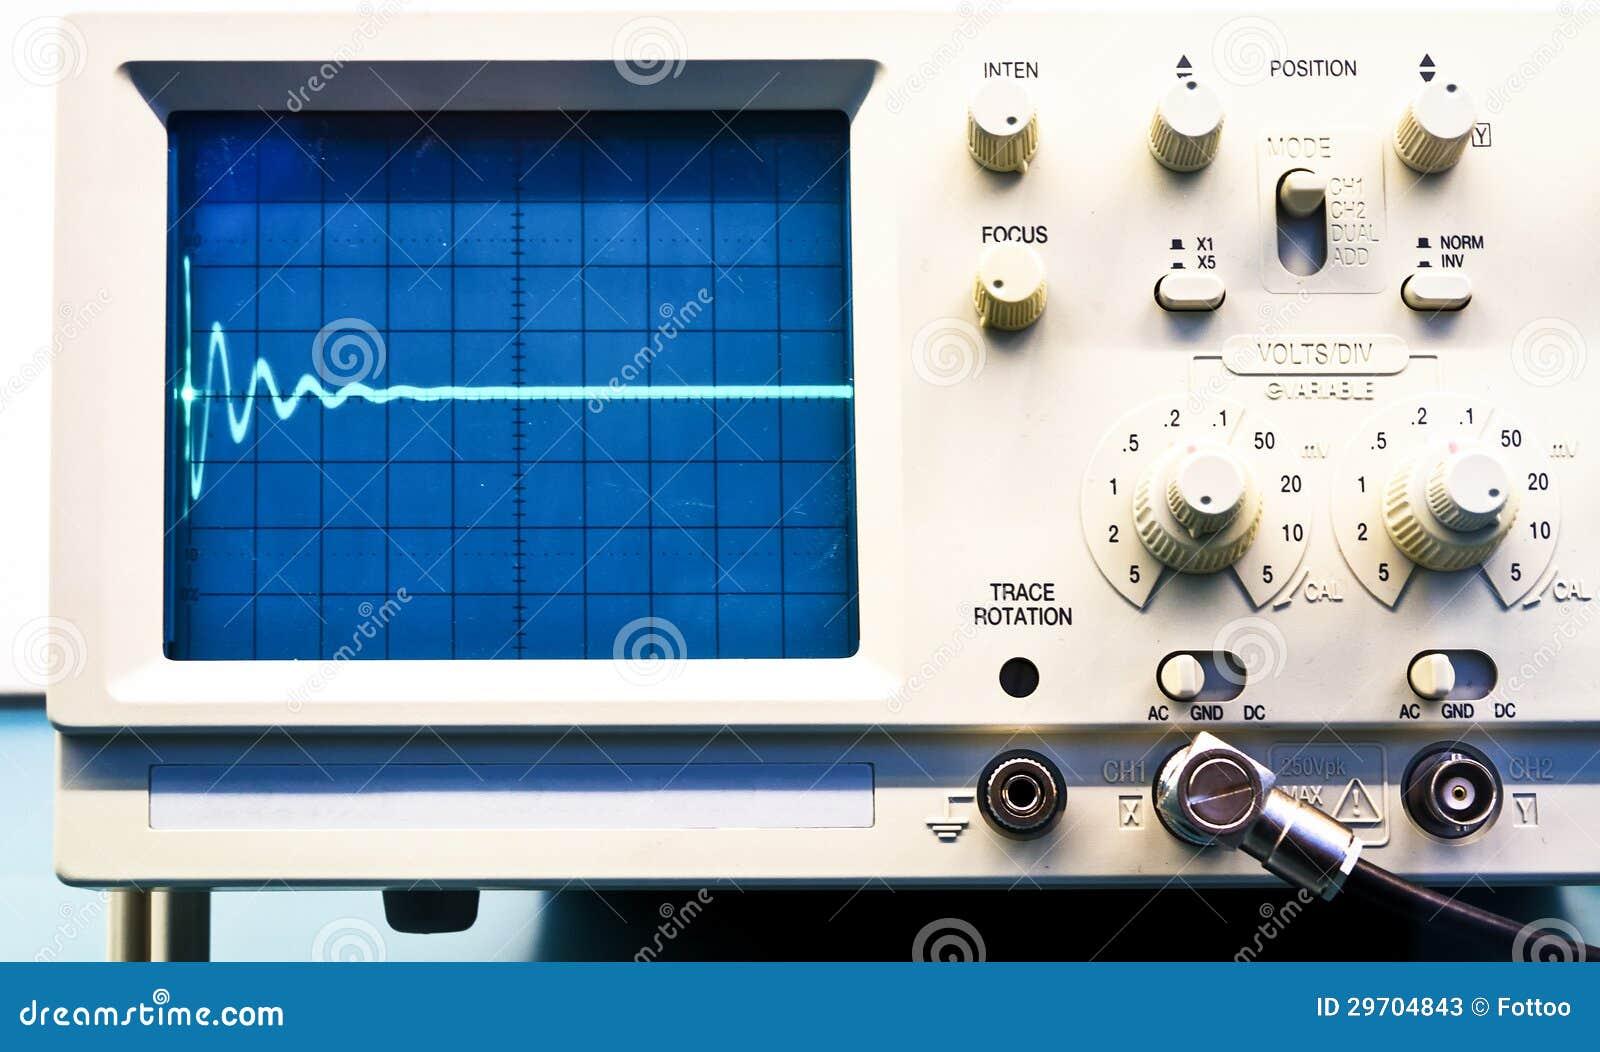 Old Oscilloscope Screen : Oscilloscope stock photos image